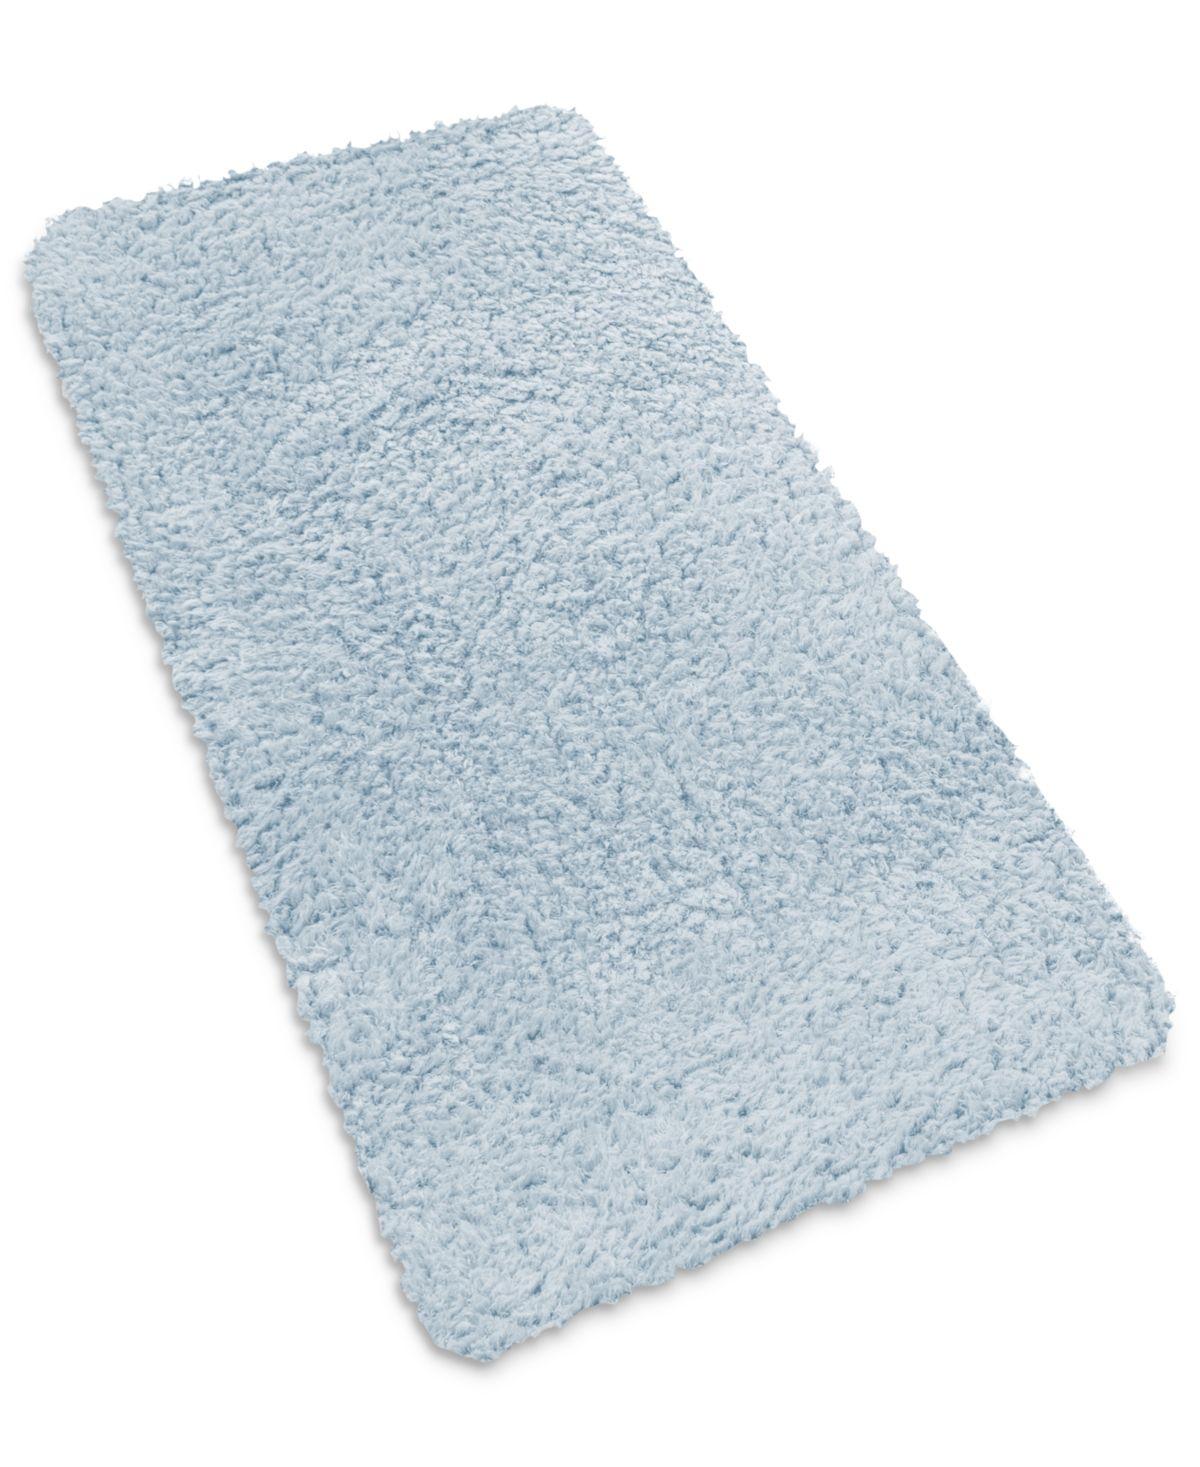 Sensorgel Closeout Soft Twist 17 X 24 Waterproof Memory Foam Bath Rug Reviews Bath Rugs Bath Mats Bed Bath Macy S Memory Foam Bath Rugs Bath Mat Sets